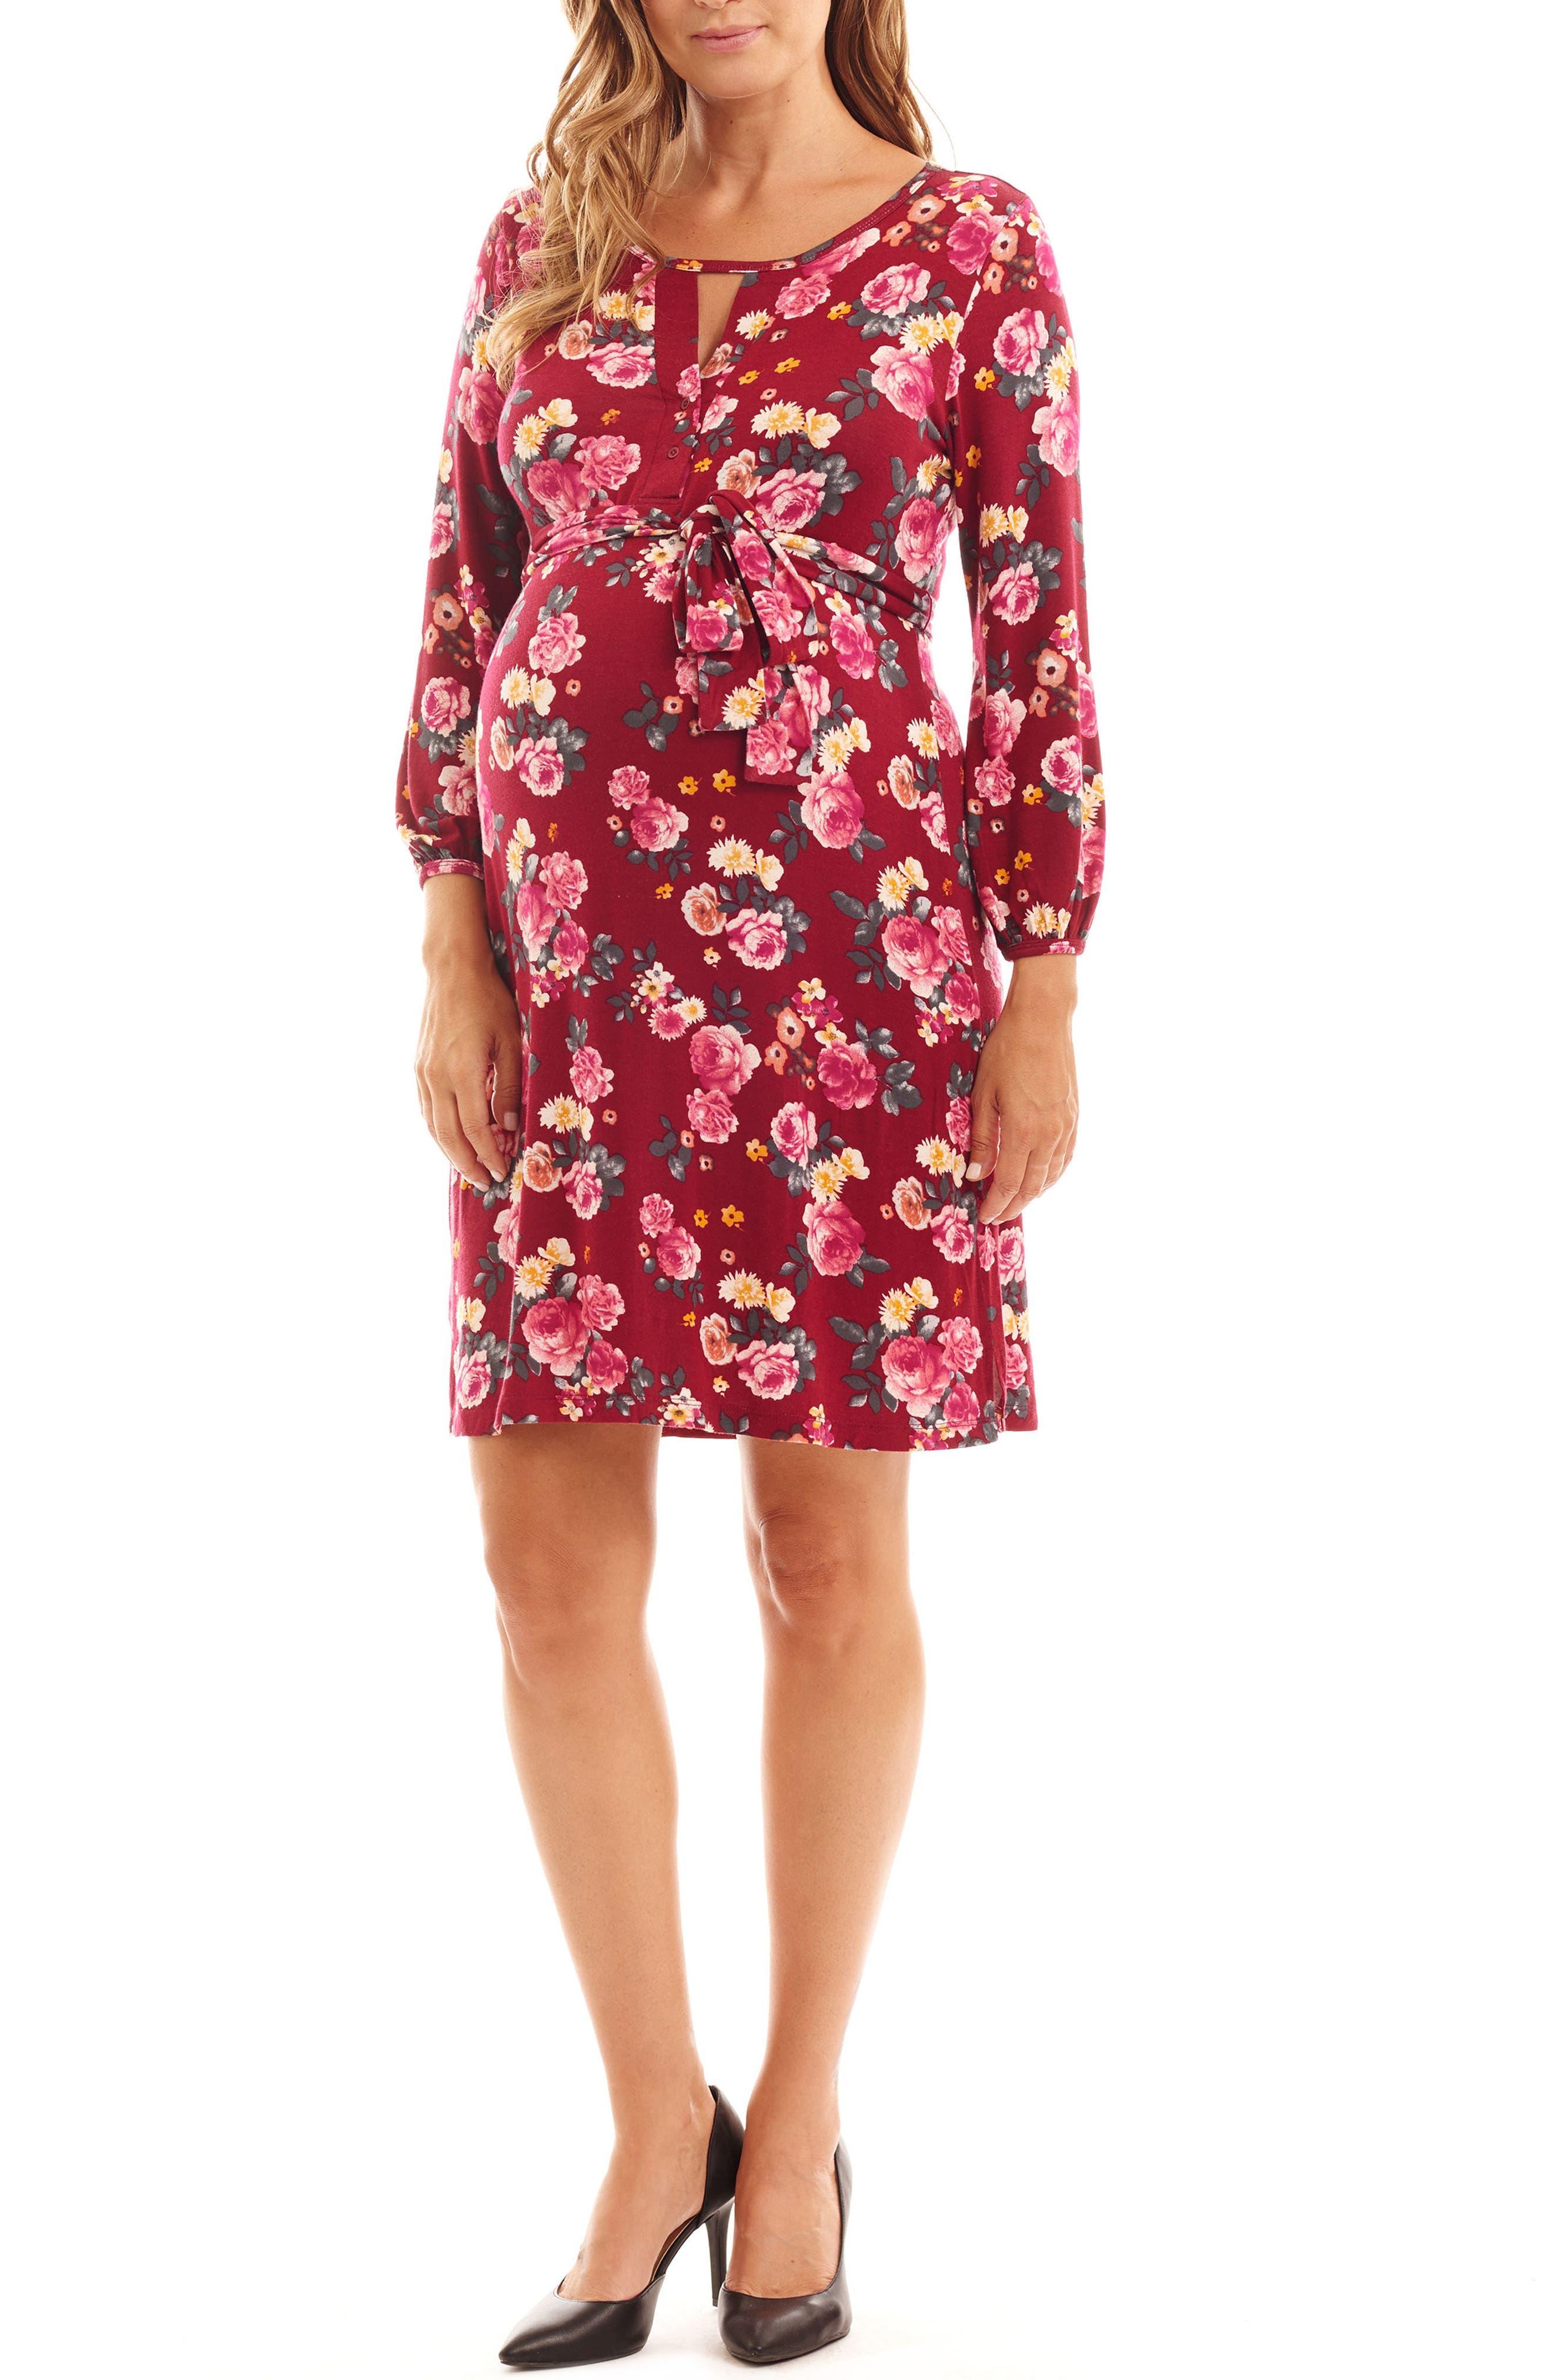 Everly Grey Lonni Maternity/nursing Shirtdress